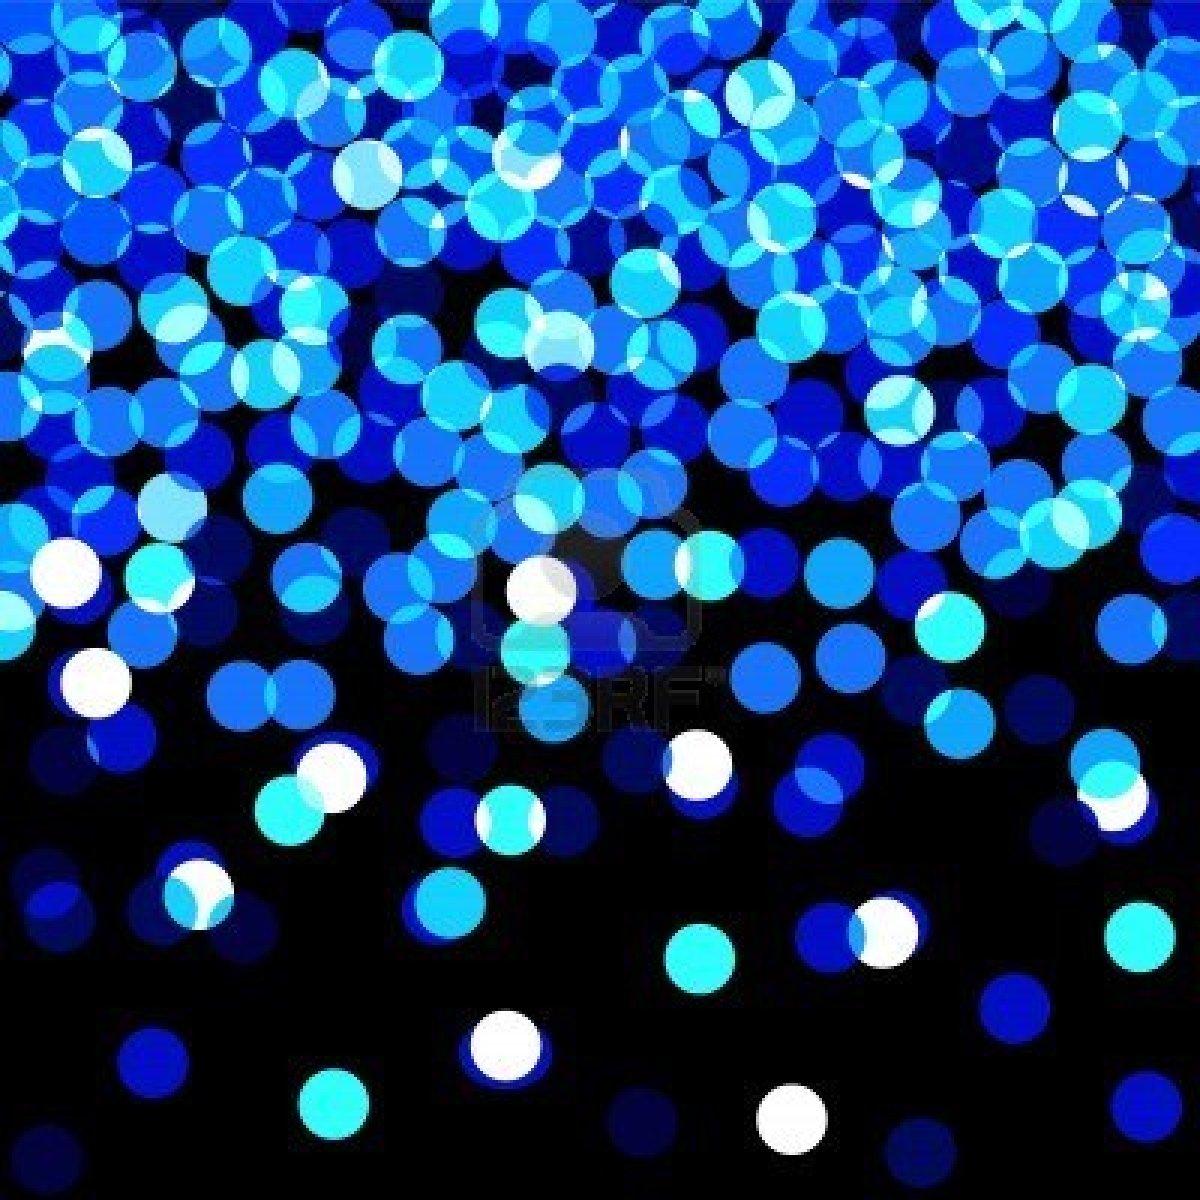 Blue Sparkle Wallpaper Wallpapersafari